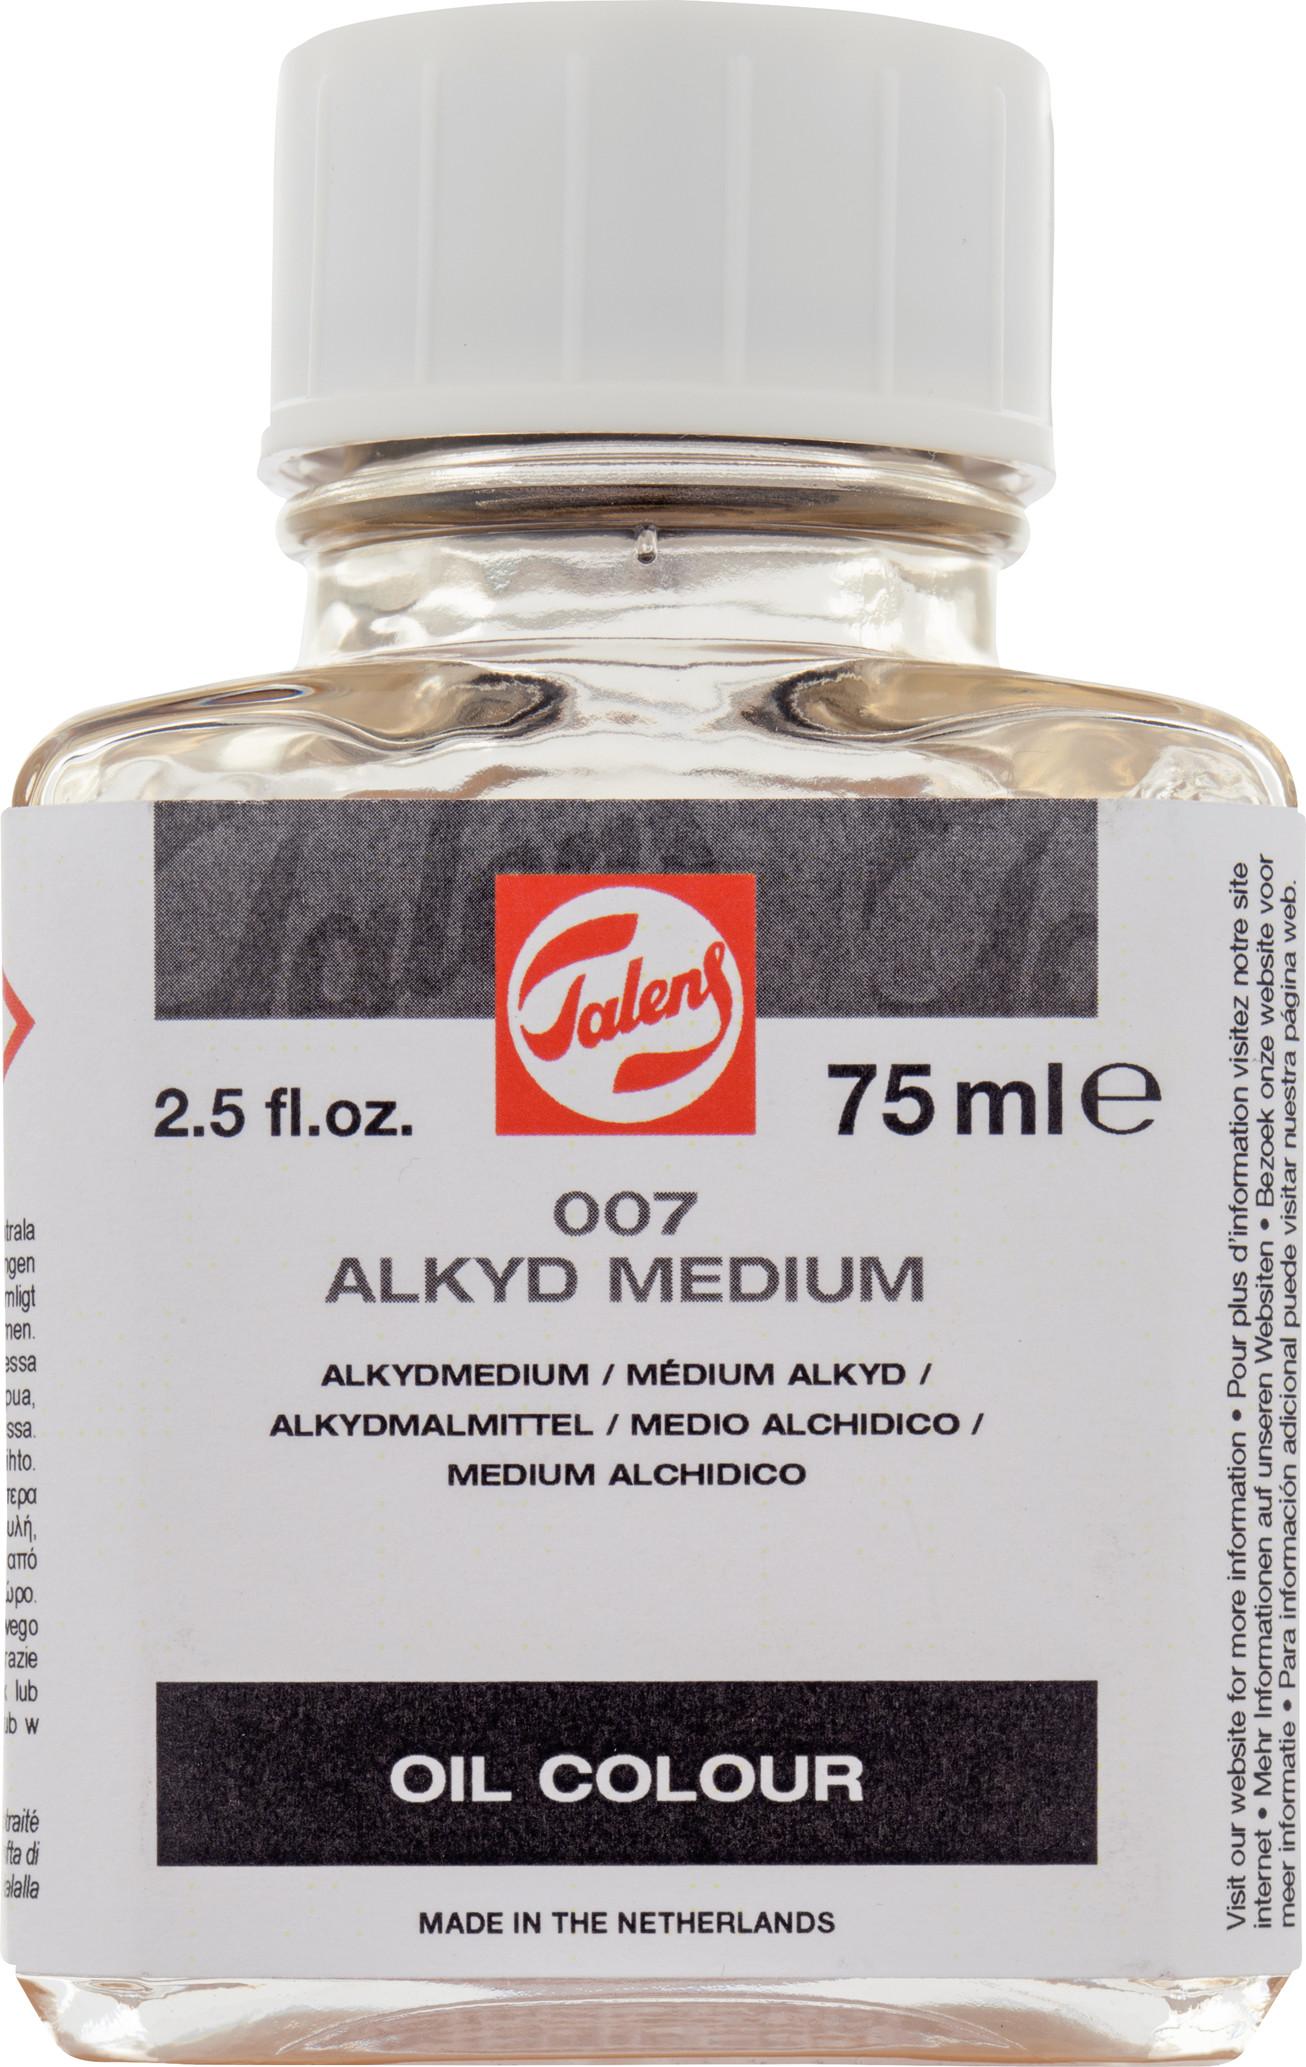 Alkyd Medium Jar 75 ml